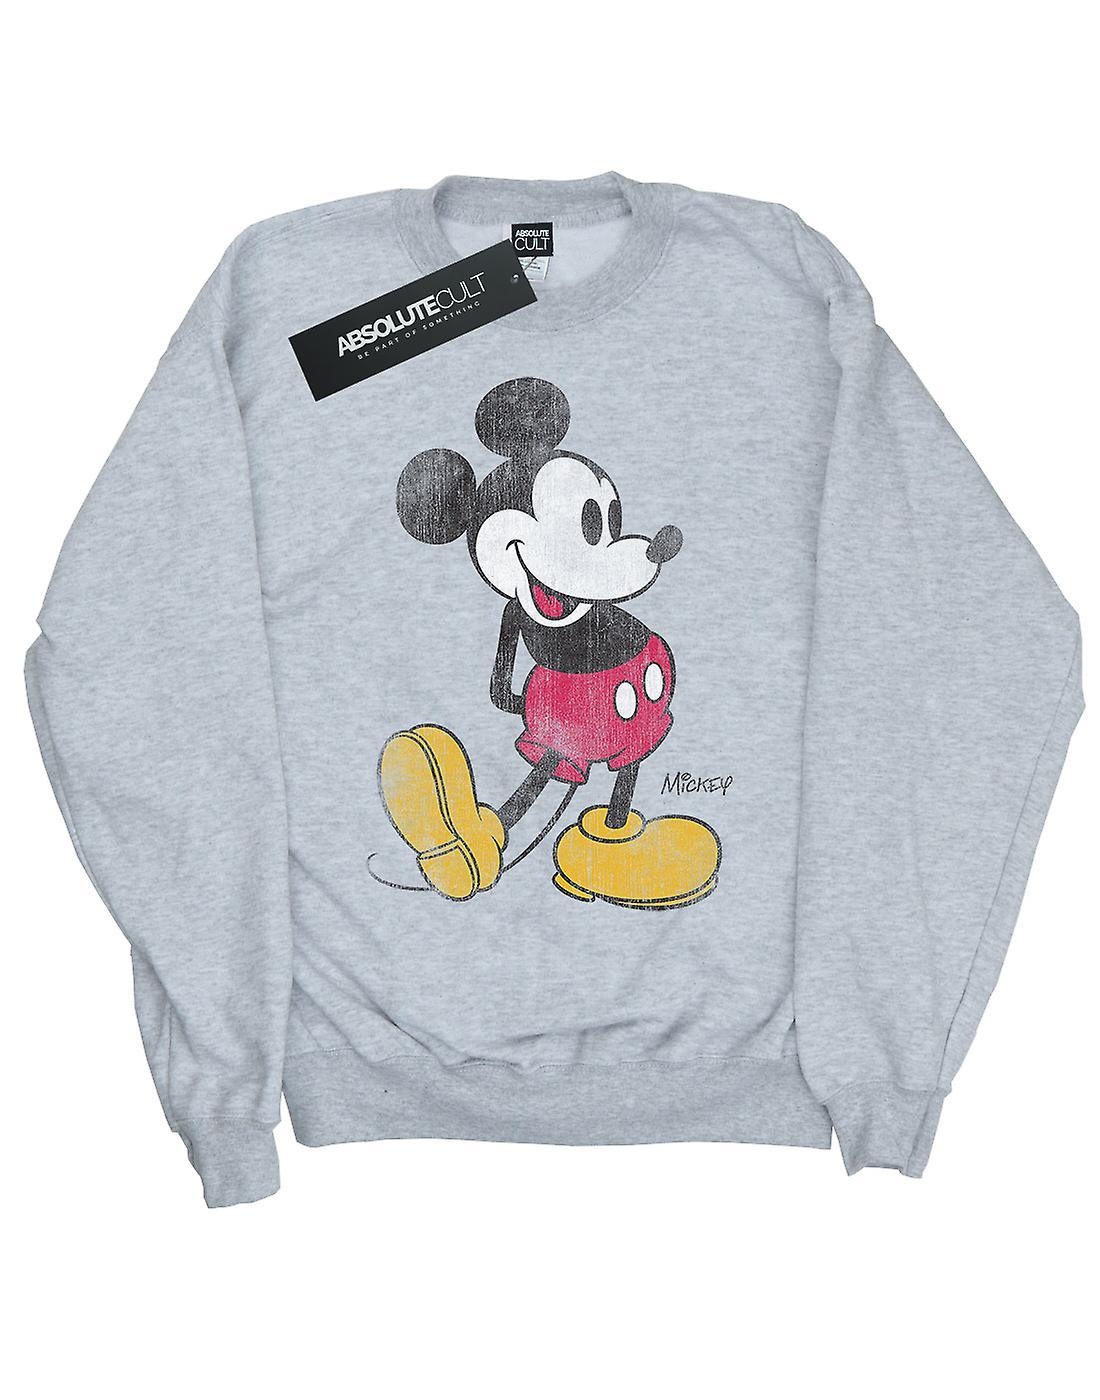 4f9cb1fcc1 Disney Girls Mickey Mouse Classic Kick Sweatshirt   Fruugo